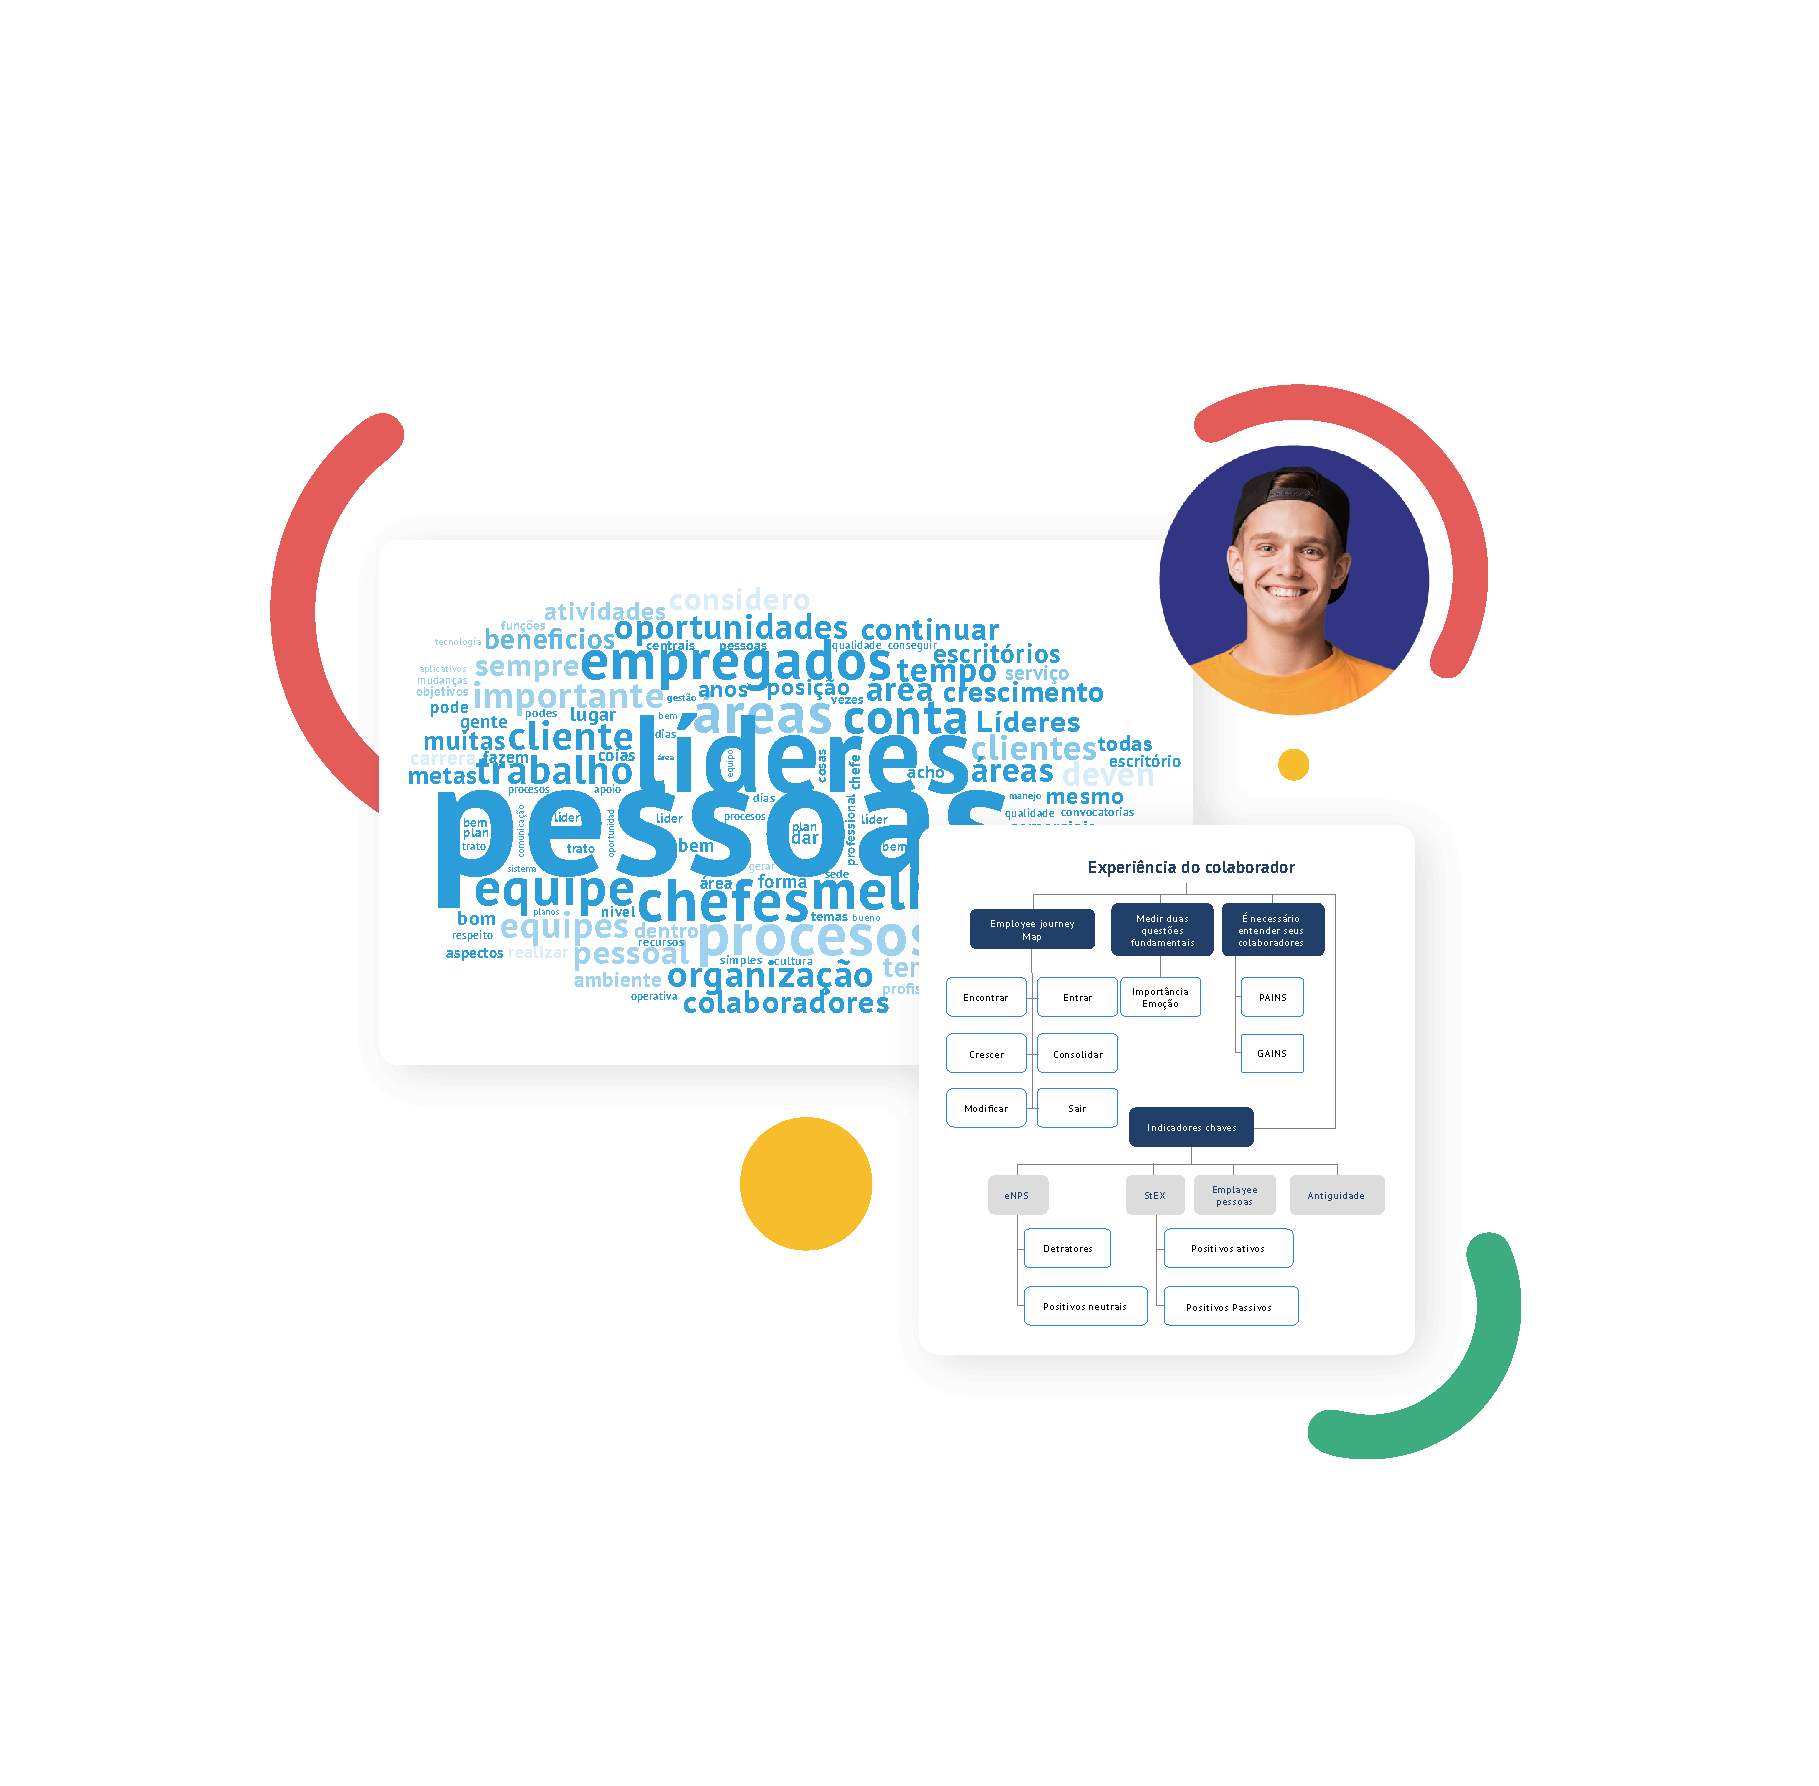 [Rankmi 2020] Employee Net Promoter Score (eNPS) - PT_eNPS-5